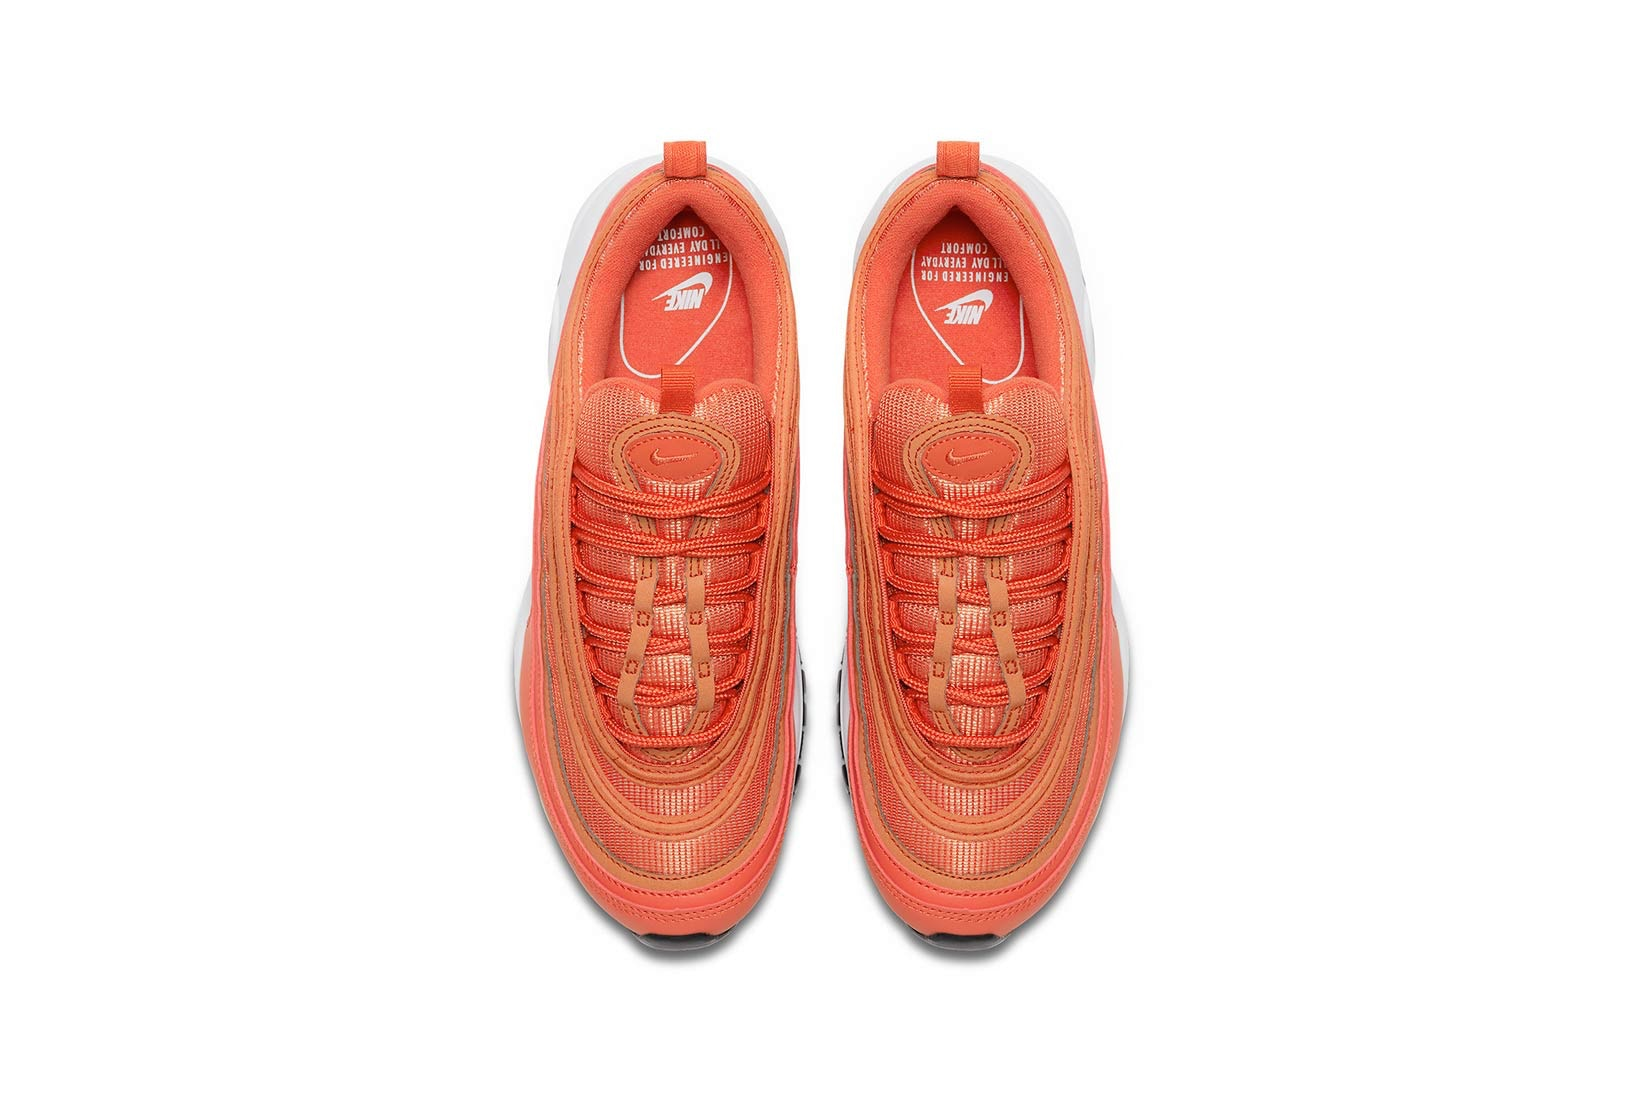 nike-air-max-97-orange-2